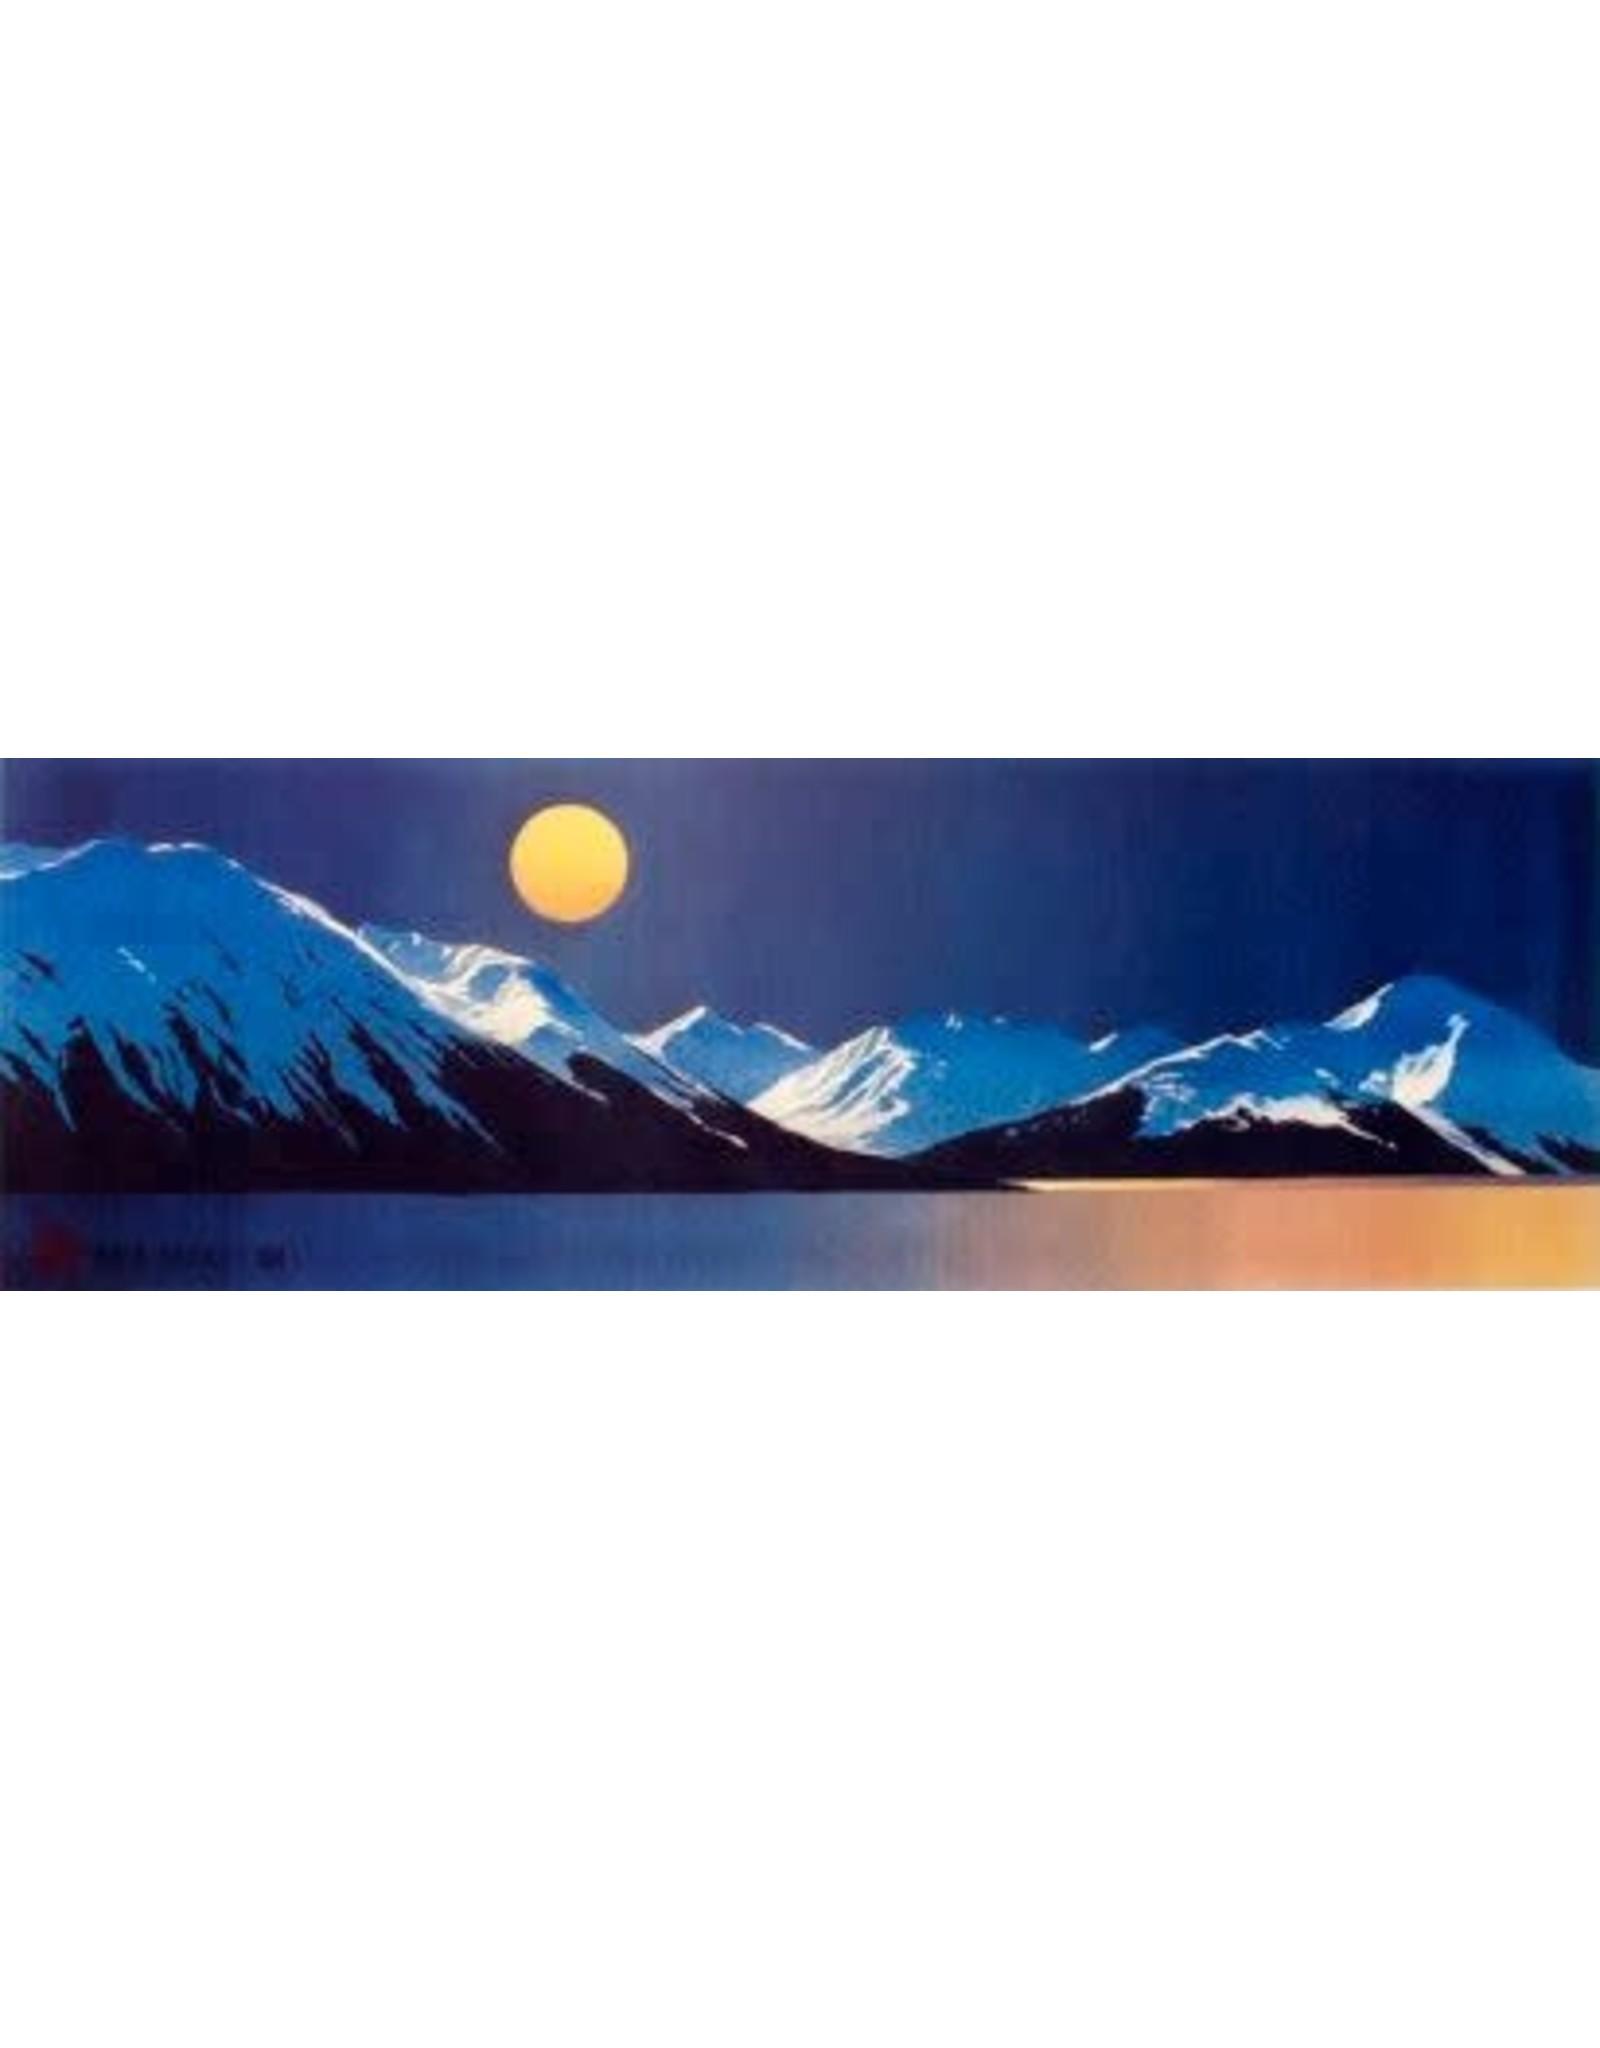 Byron Birdsall And the Moon Be Still As Bright | Byron Birdsall